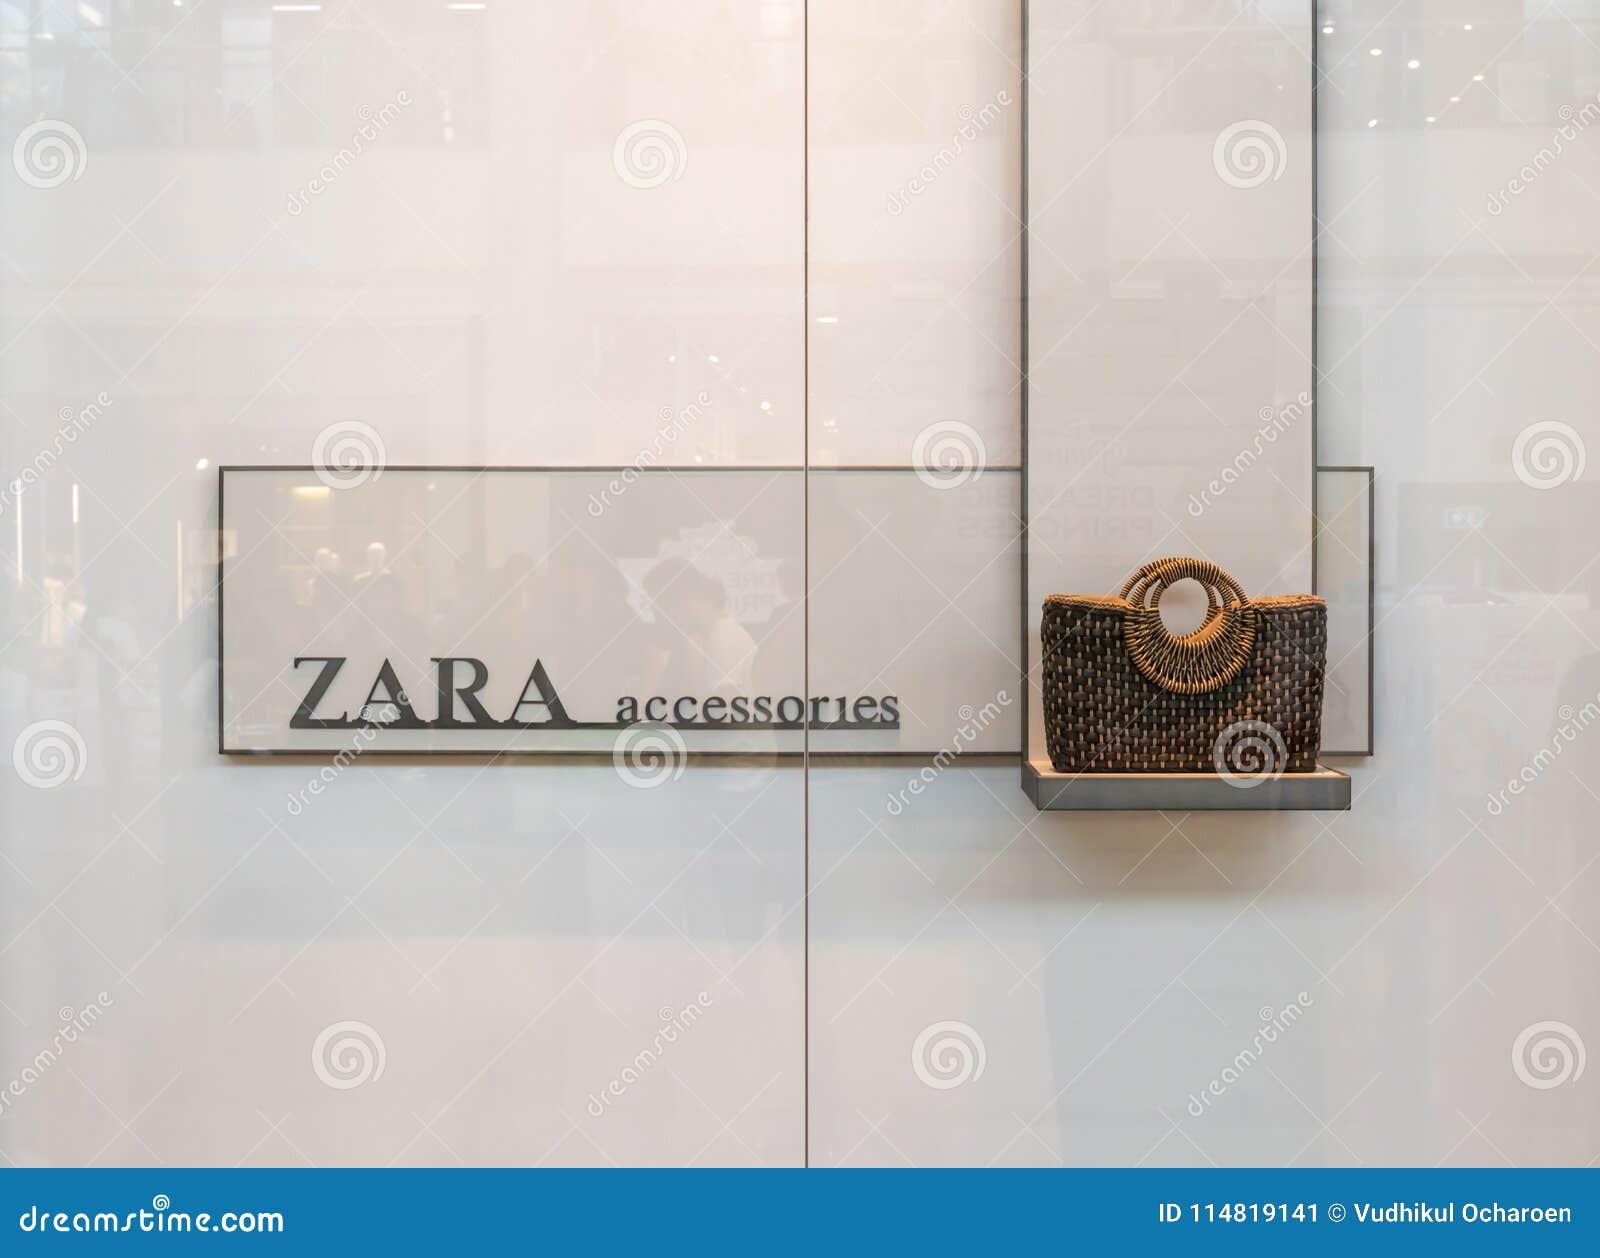 Zara Shop At Emquatier Bangkok Thailand April 1 2018 Editorial